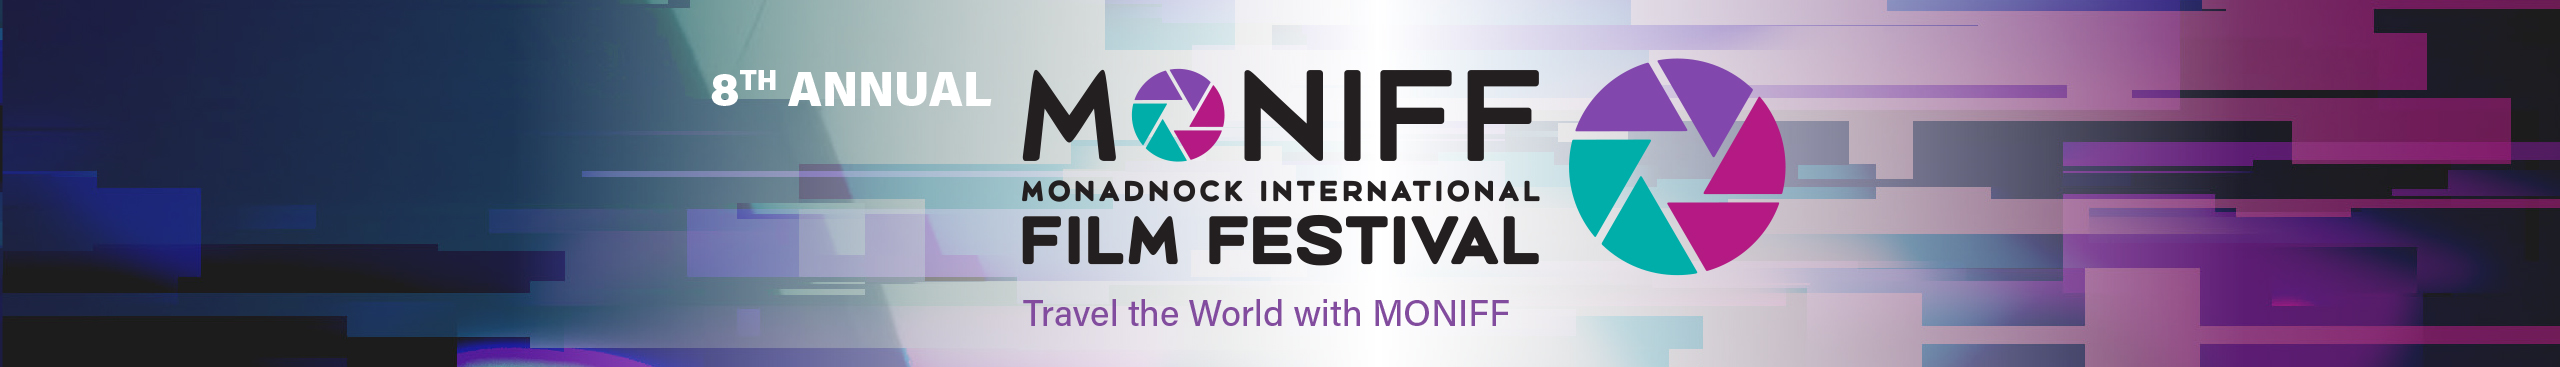 MONIFF 2020 Film Festival